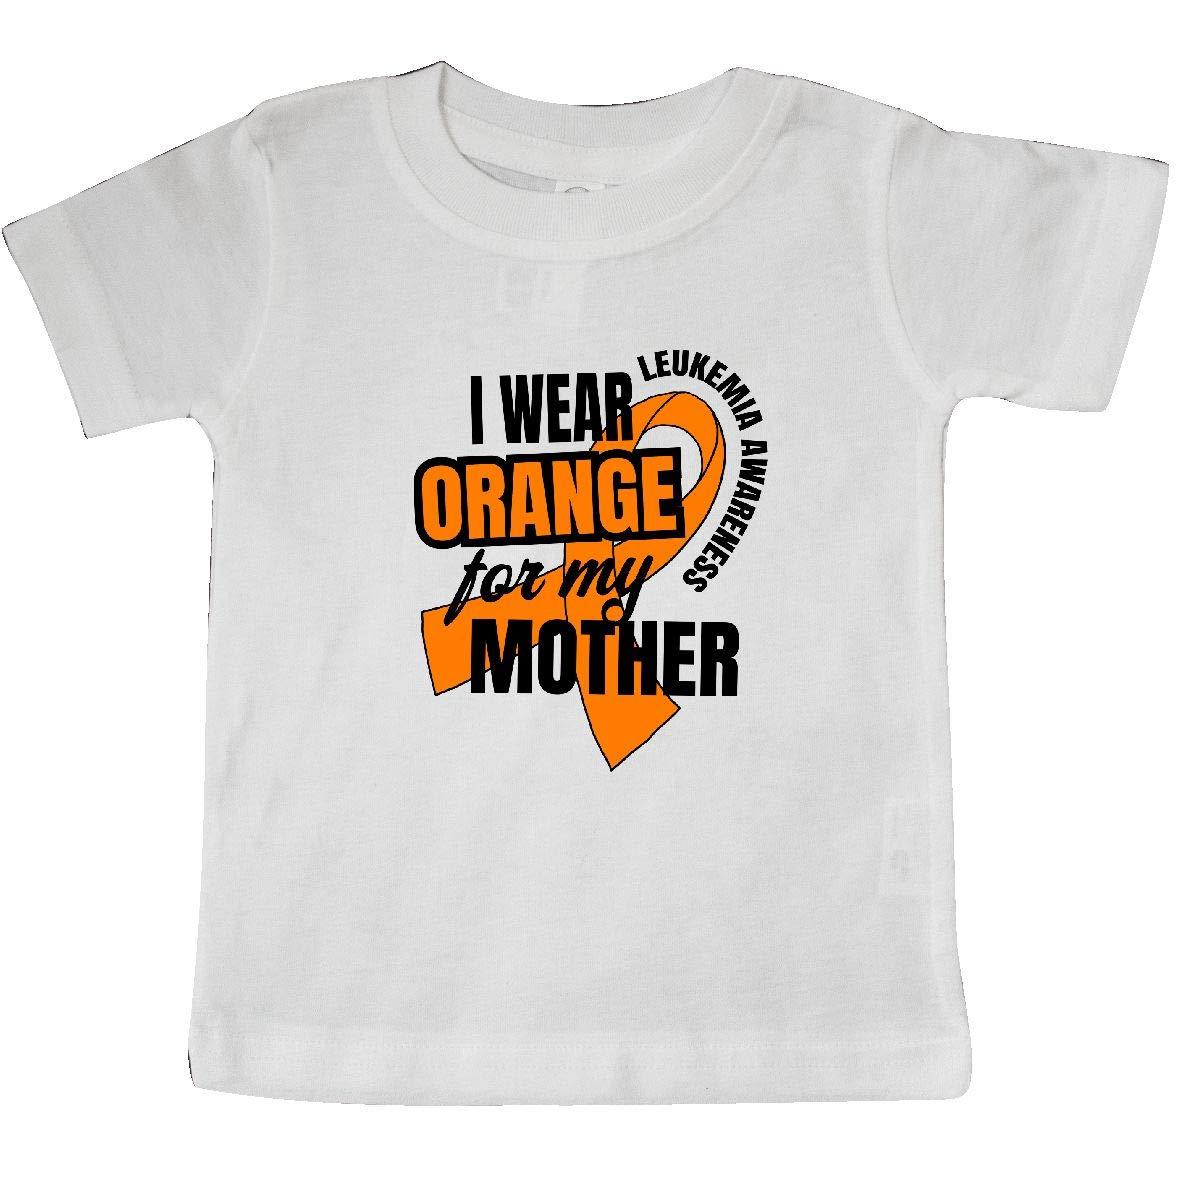 inktastic I Wear Orange for My Mother Leukemia Awareness Baby T-Shirt